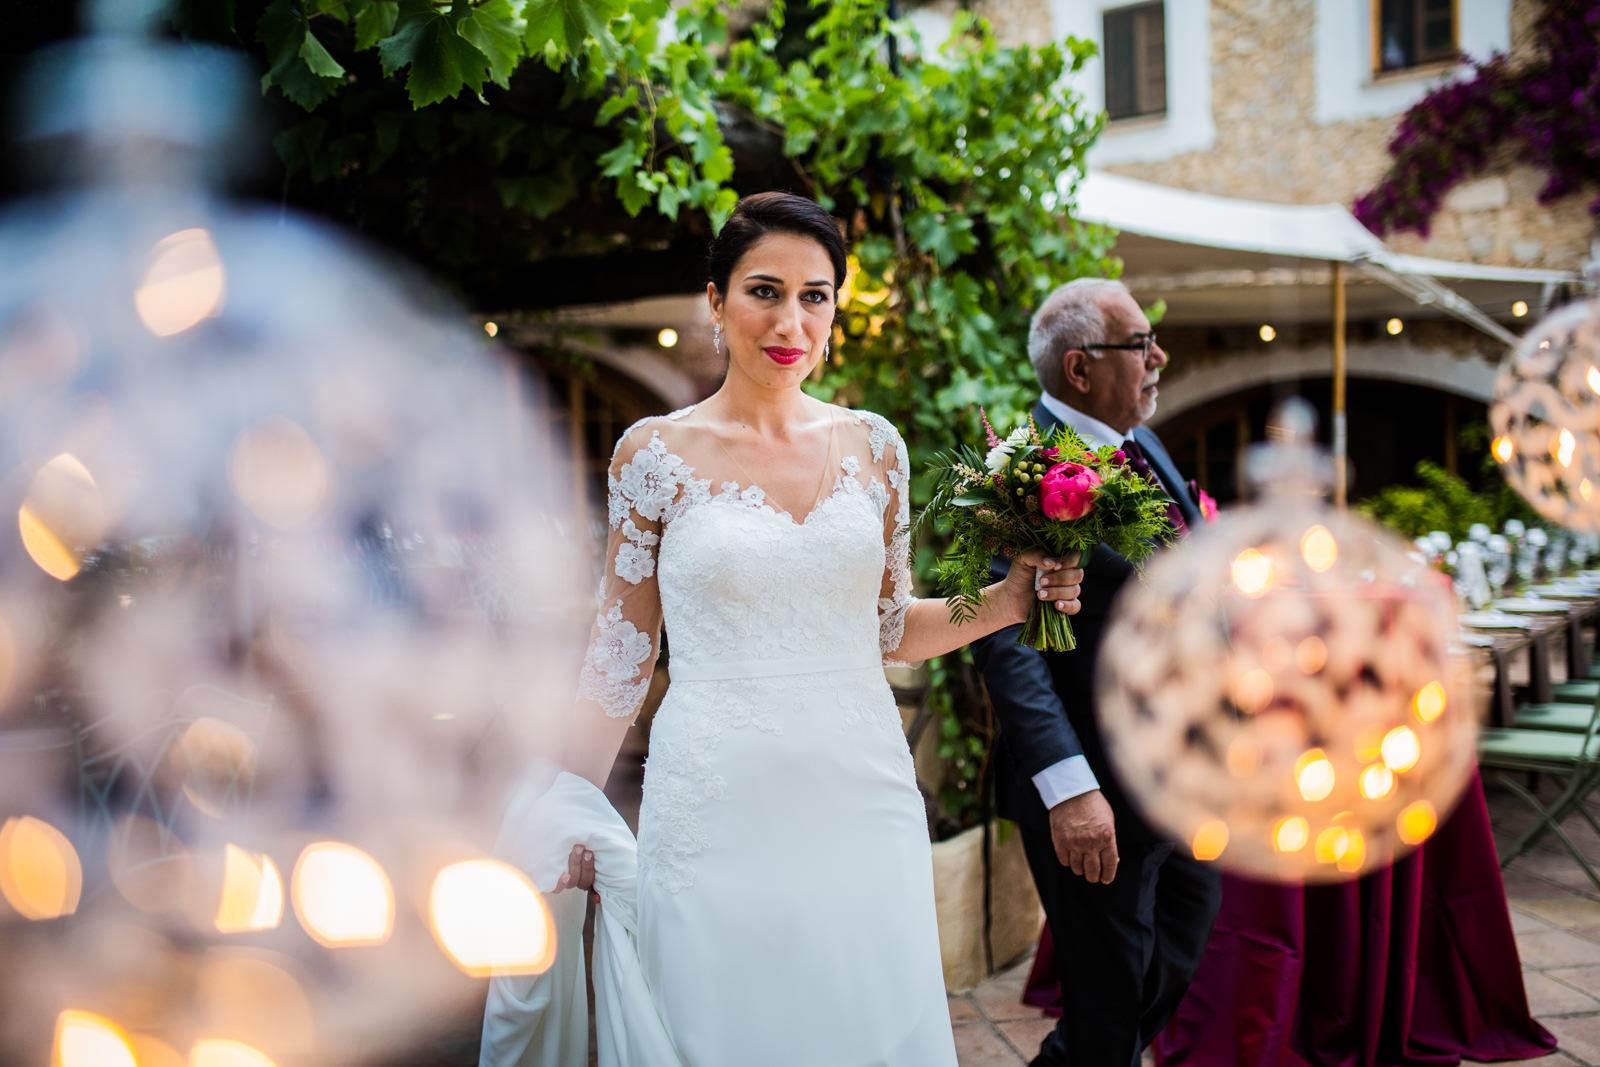 Almirall-Font-sitges-marbella-engagement-Rafael-Torres-fotografo-bodas-sevilla-madrid-barcelona-wedding-photographer--29.jpg